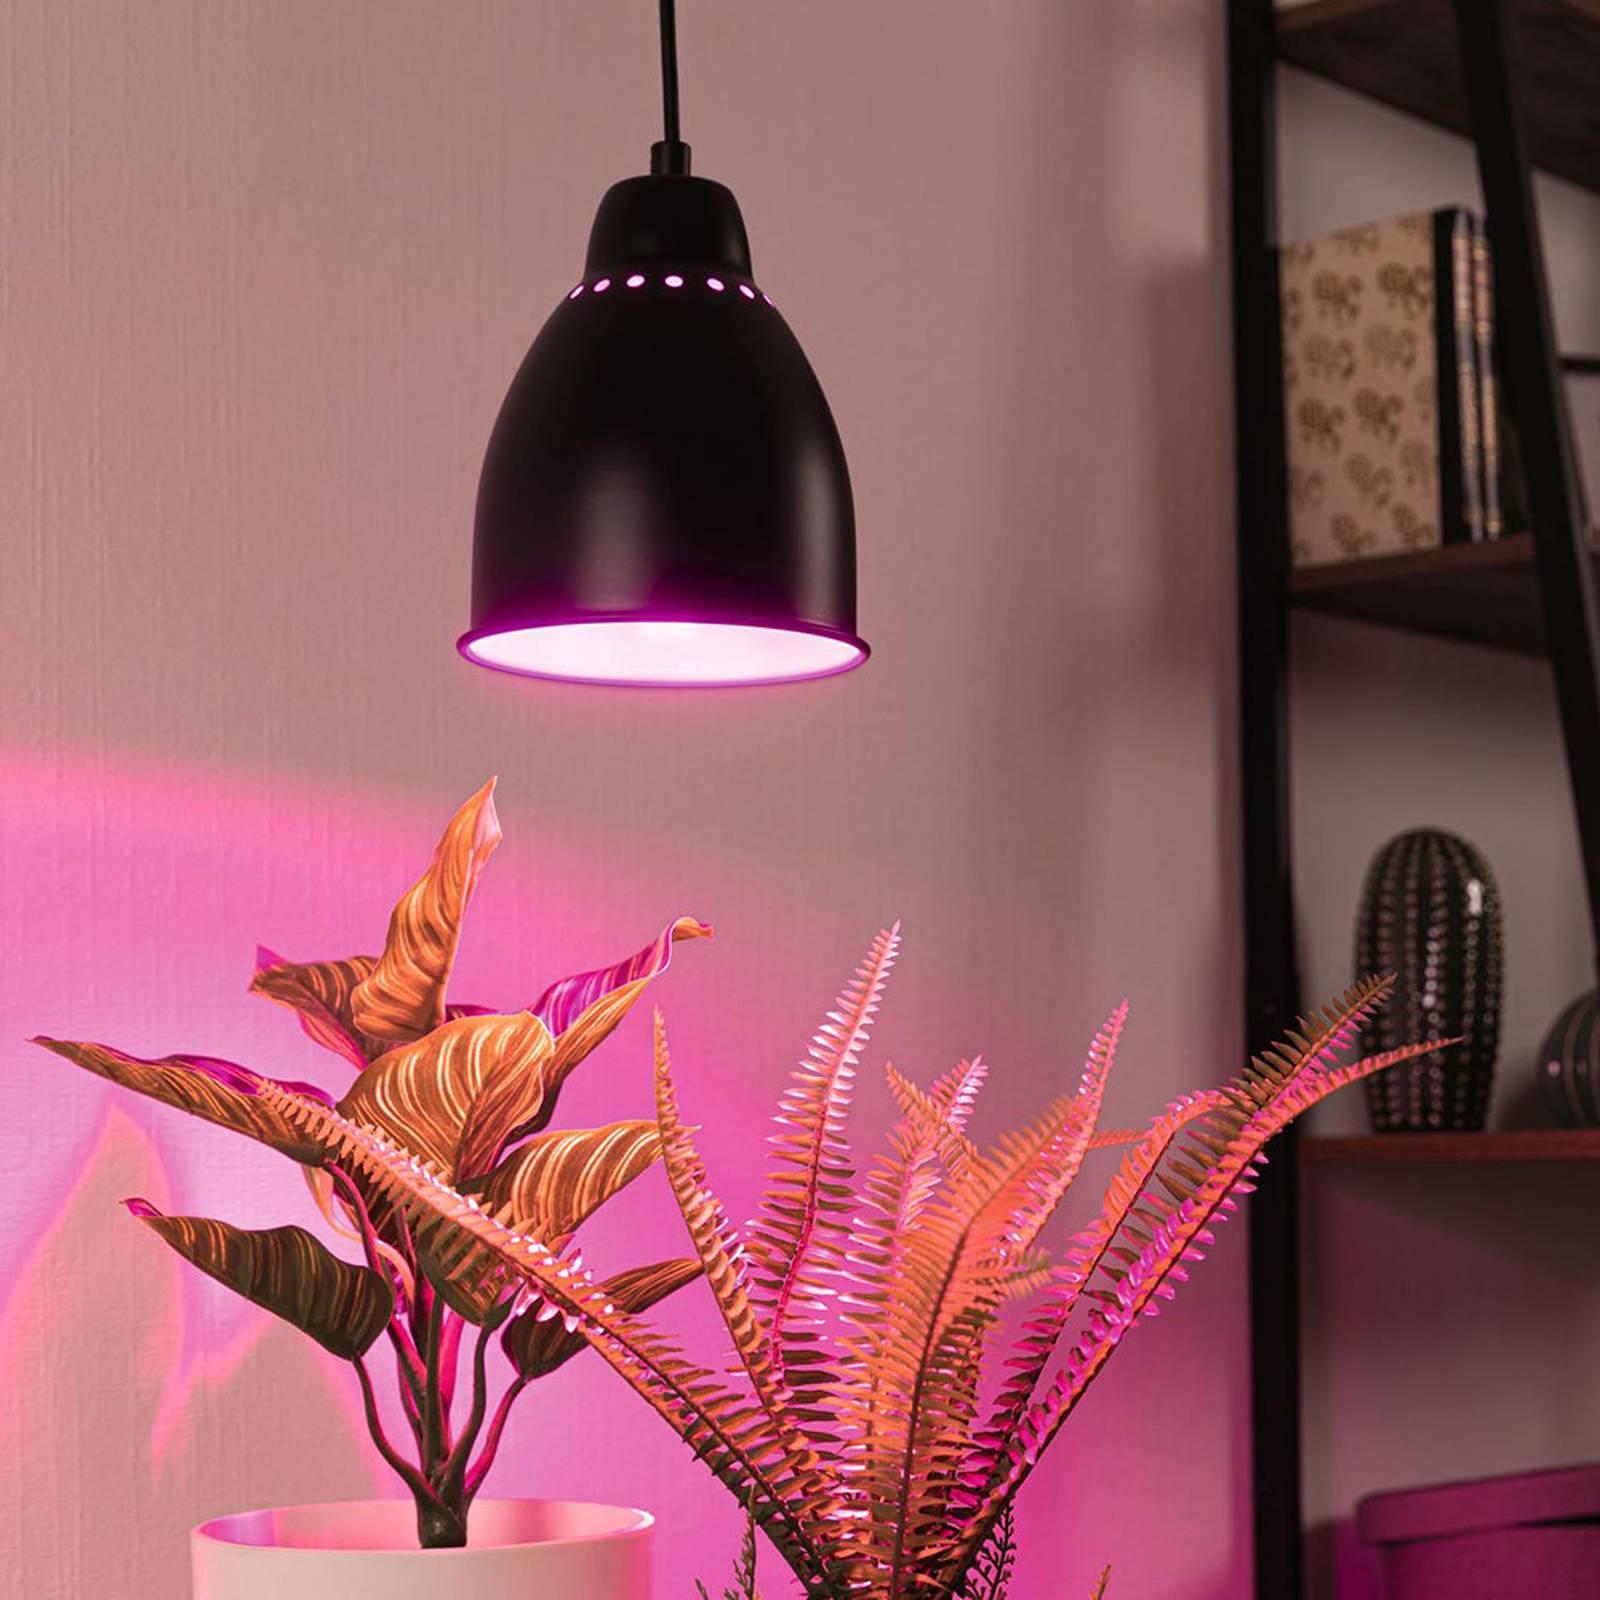 Paulmann Neordic Hilla hanglamp, zwart